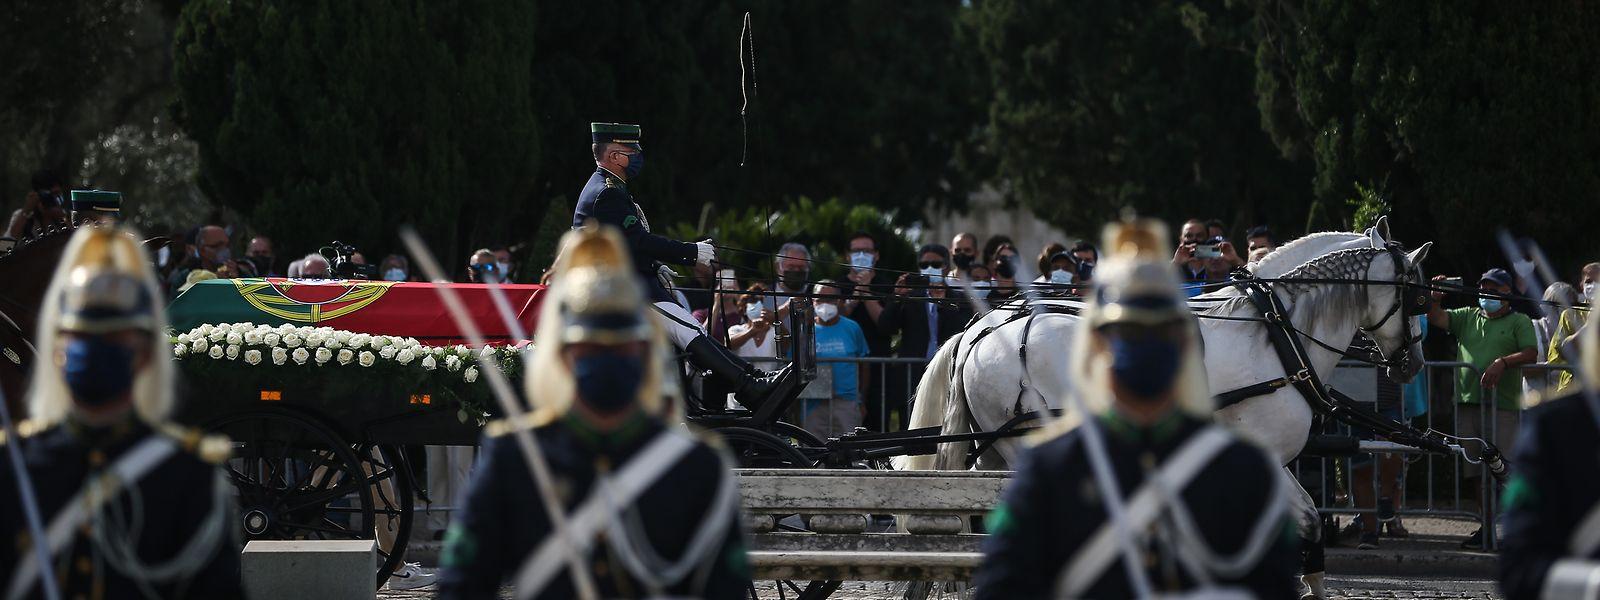 Funeral de Jorge Sampaio